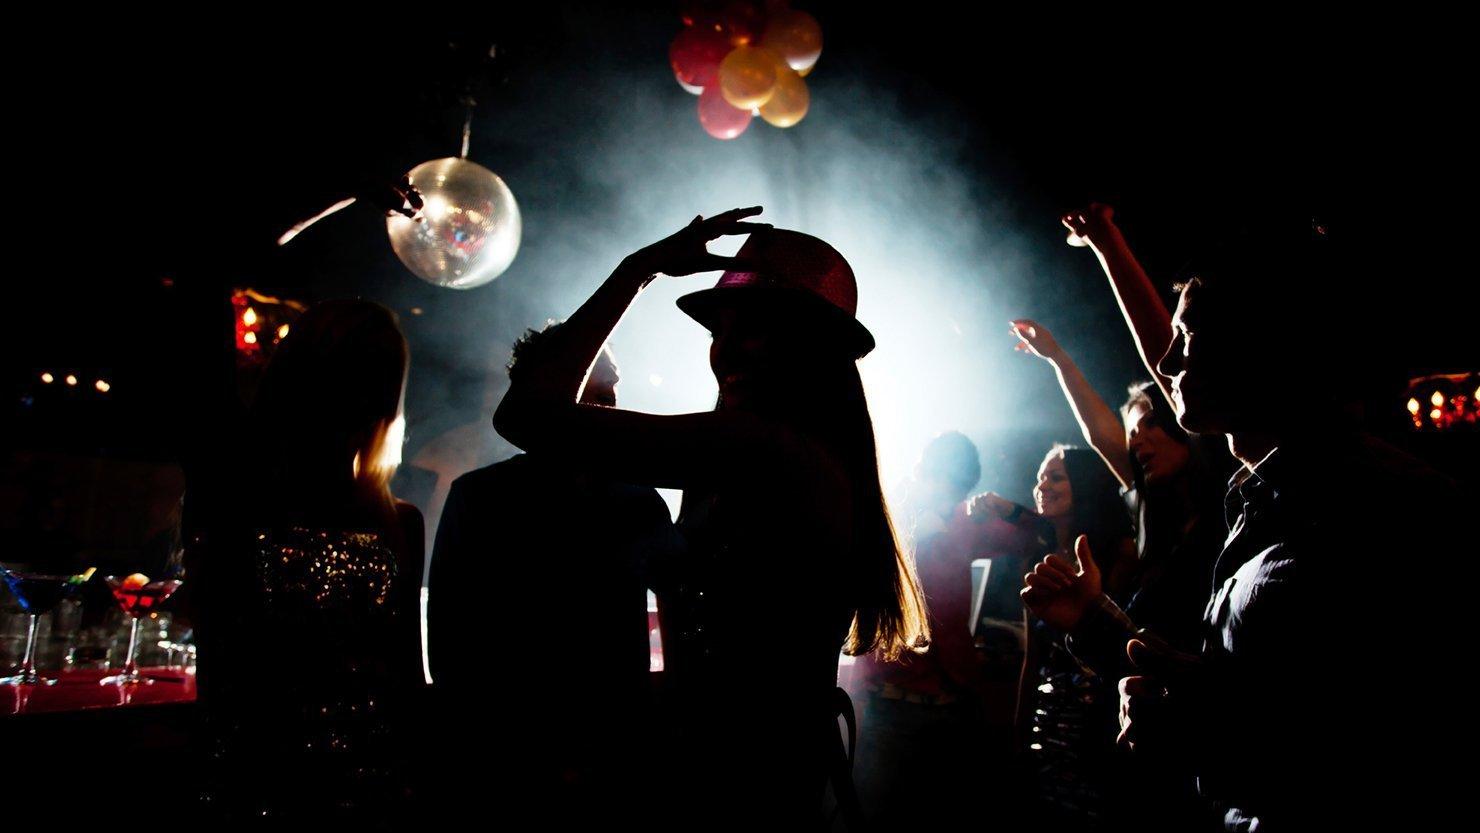 CHAUVET DJ. Mini Strobe LED Compact Strobe Light/Party Light | Laser & Strobe Effects by CHAUVET DJ.